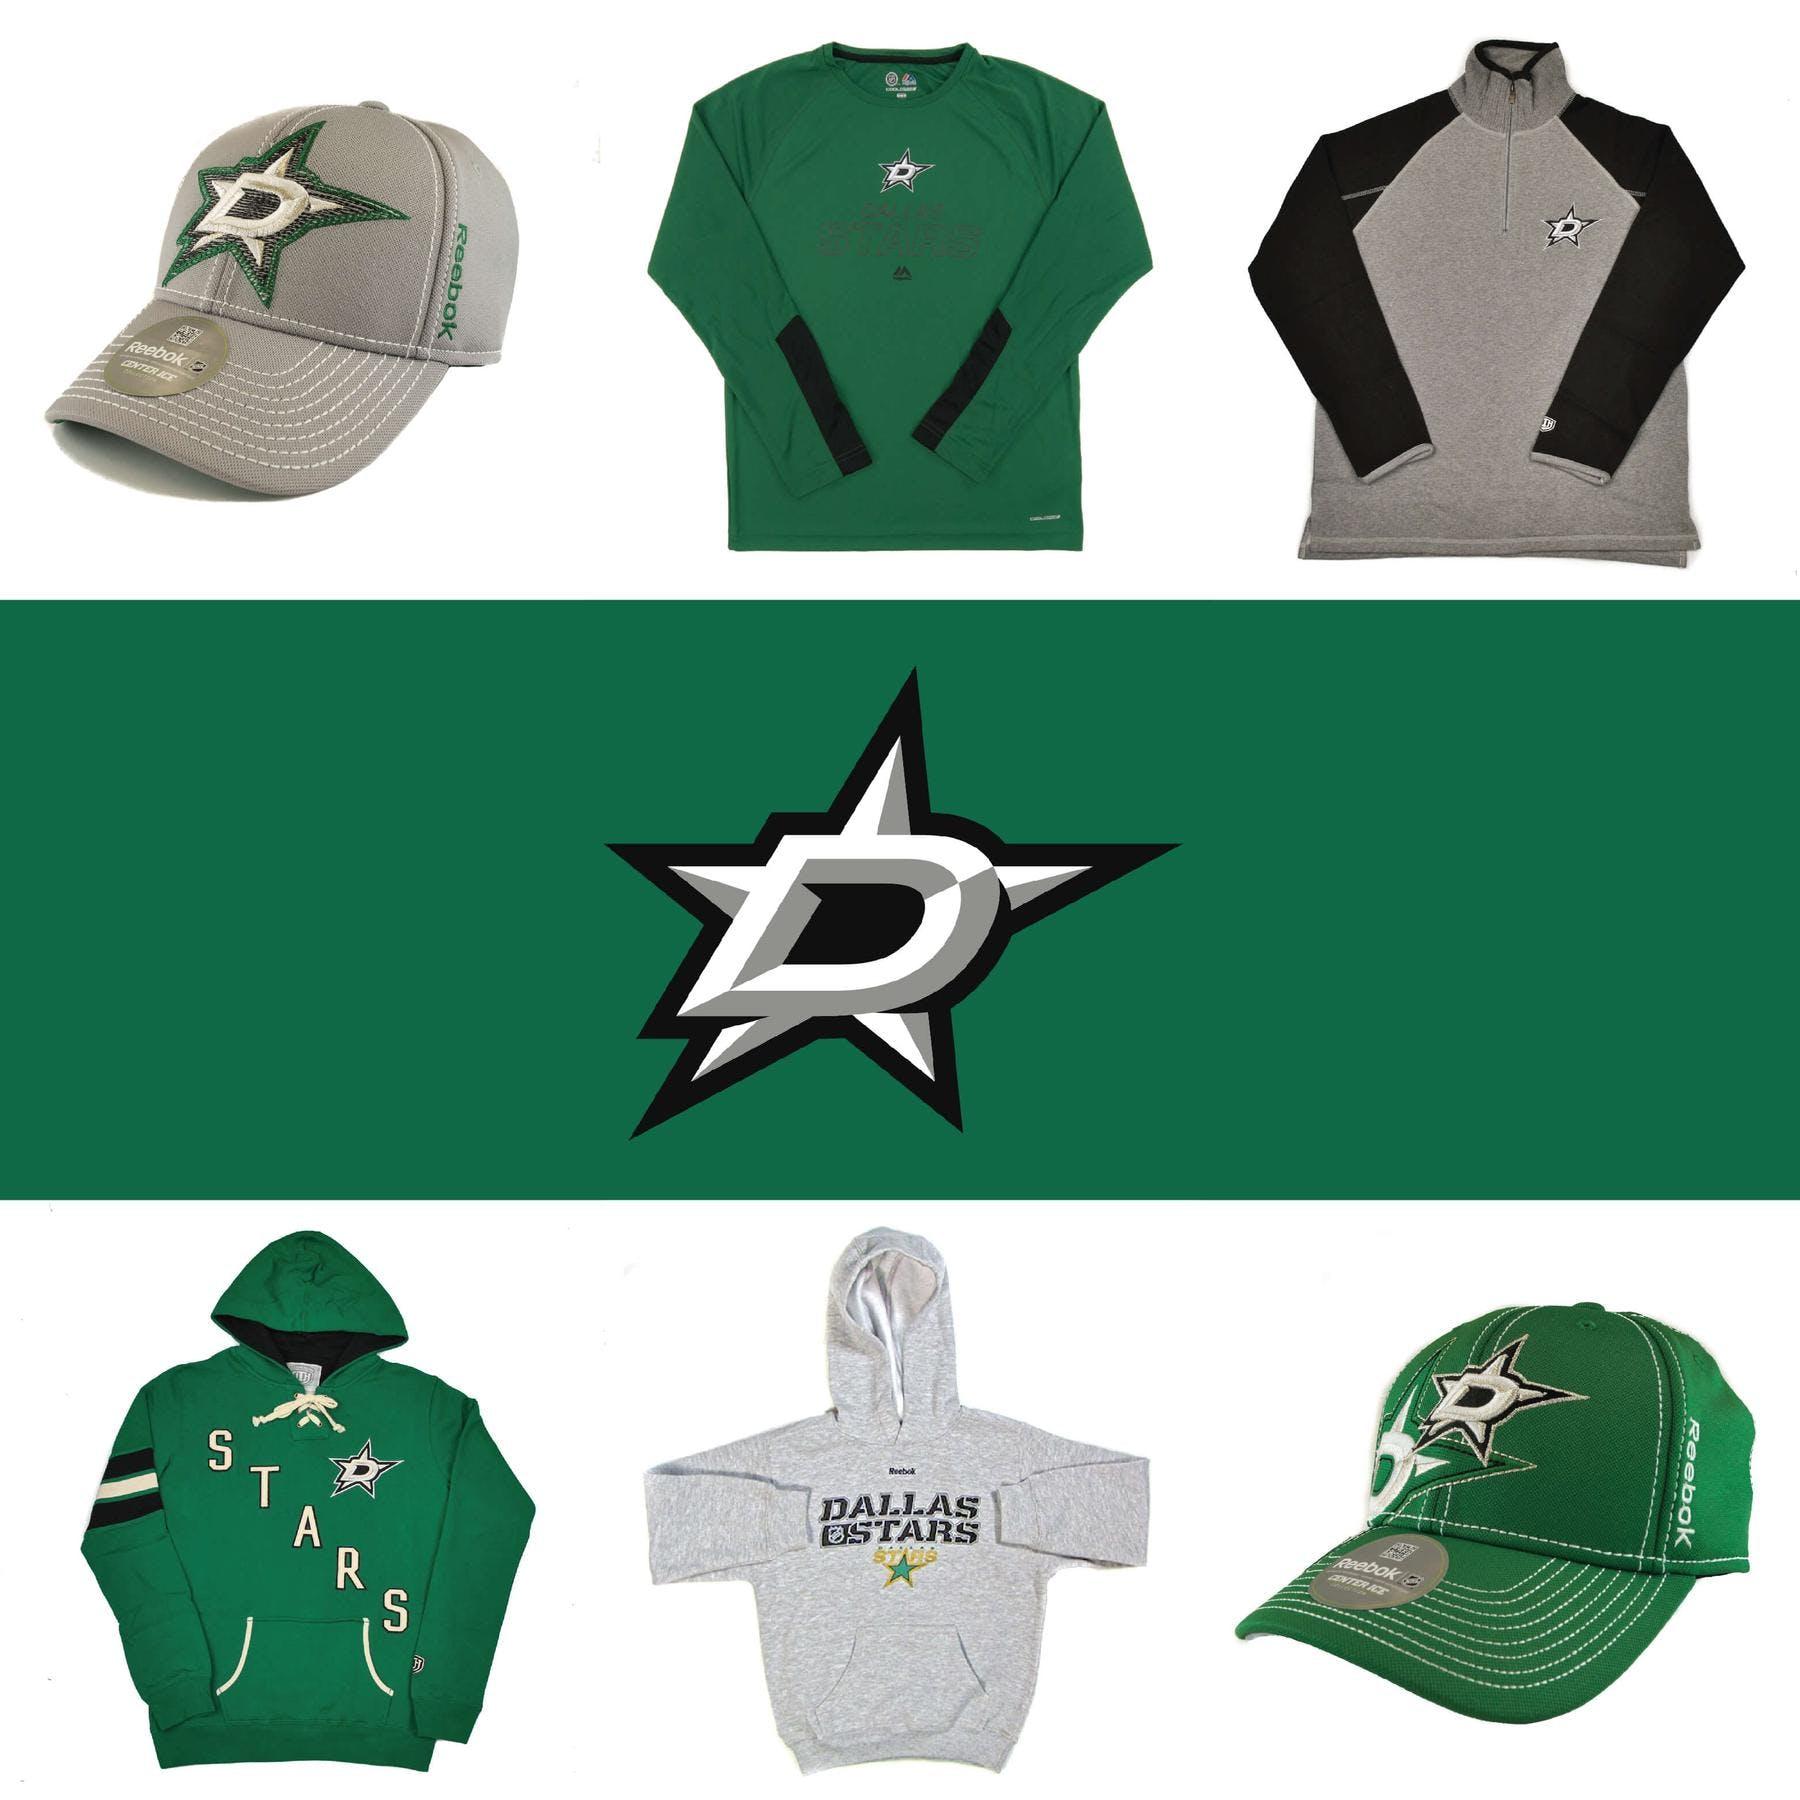 bc23fa17 Dallas Stars Officially Licensed NHL Apparel Liquidation - 340+ Items,  $14,500+ SRP!